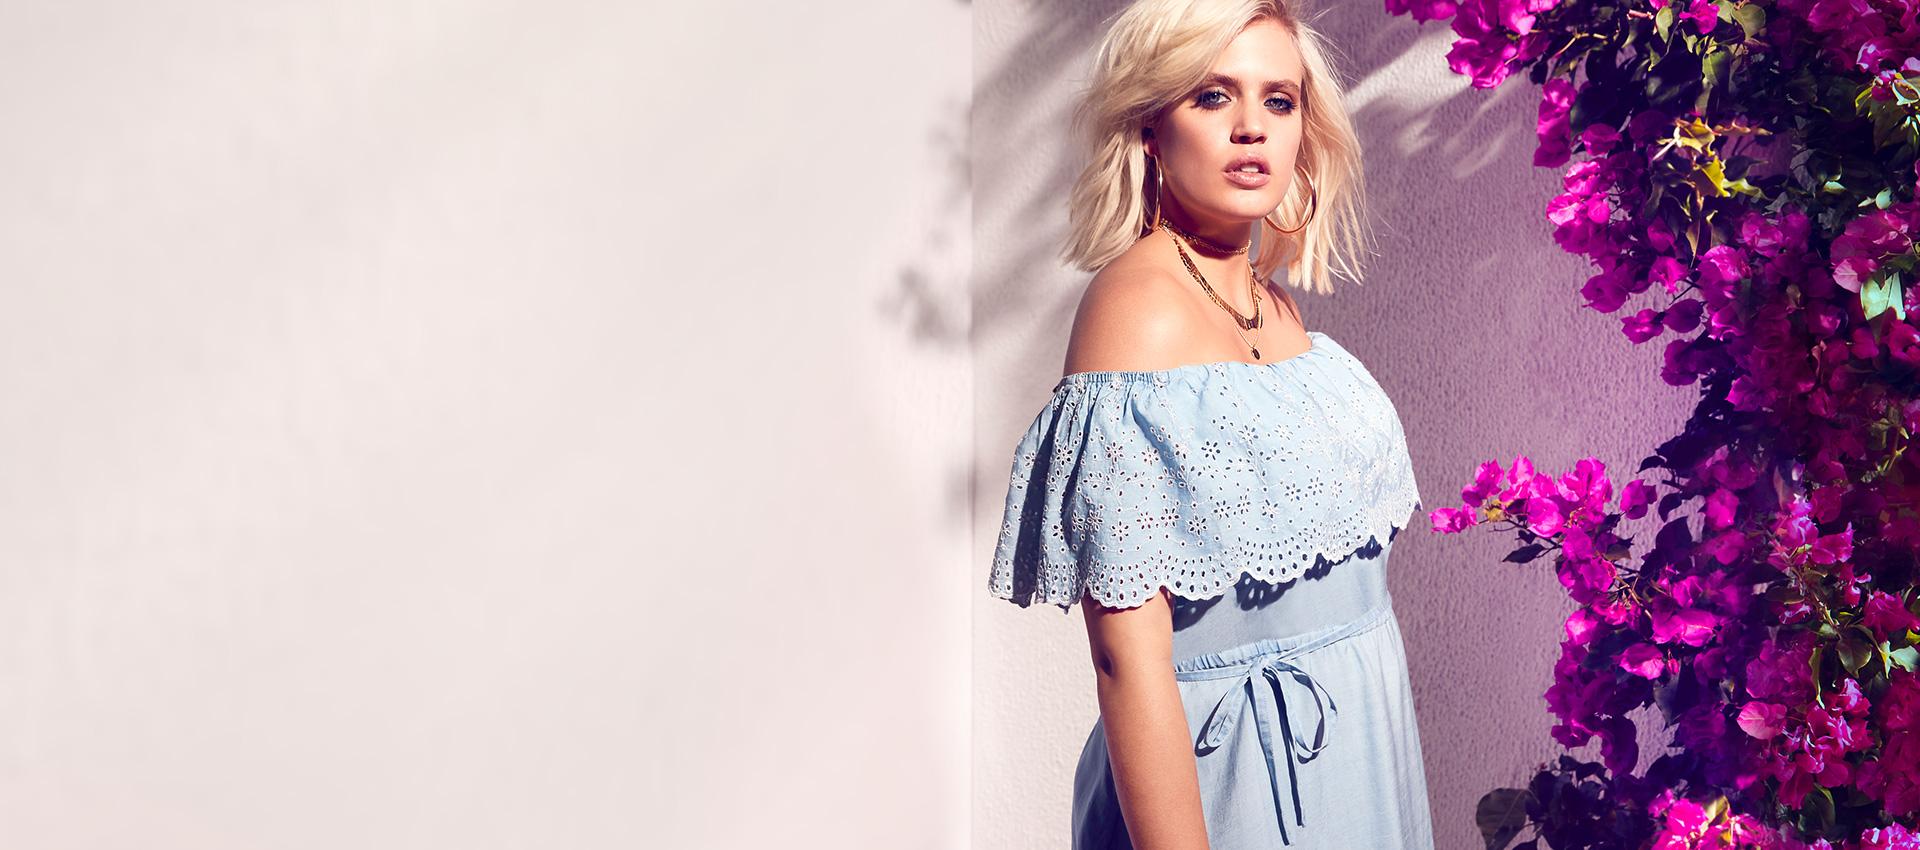 Swoon-worthy summer dresses